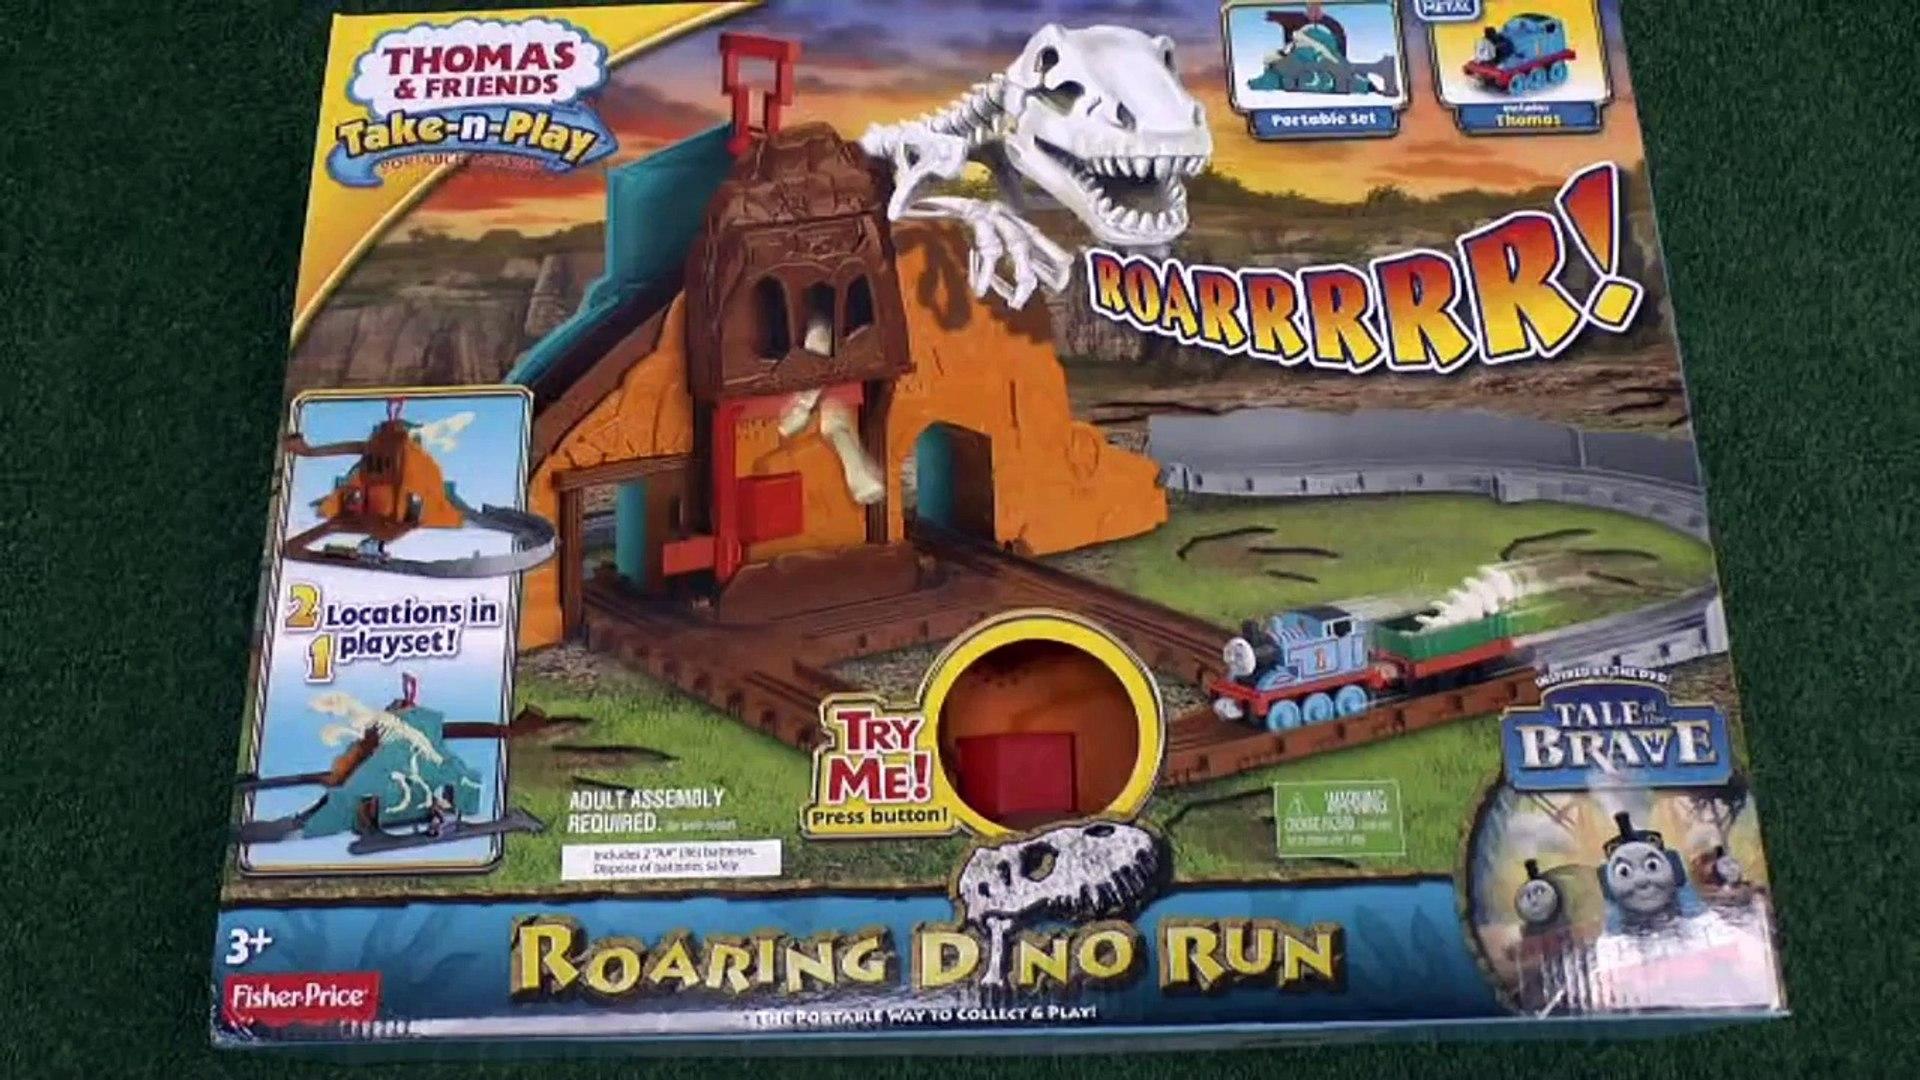 Thomas & Friends Tale Of The Brave Play Doh Take N Play Roaring Dino Run  Thomas Tank Play-Doh